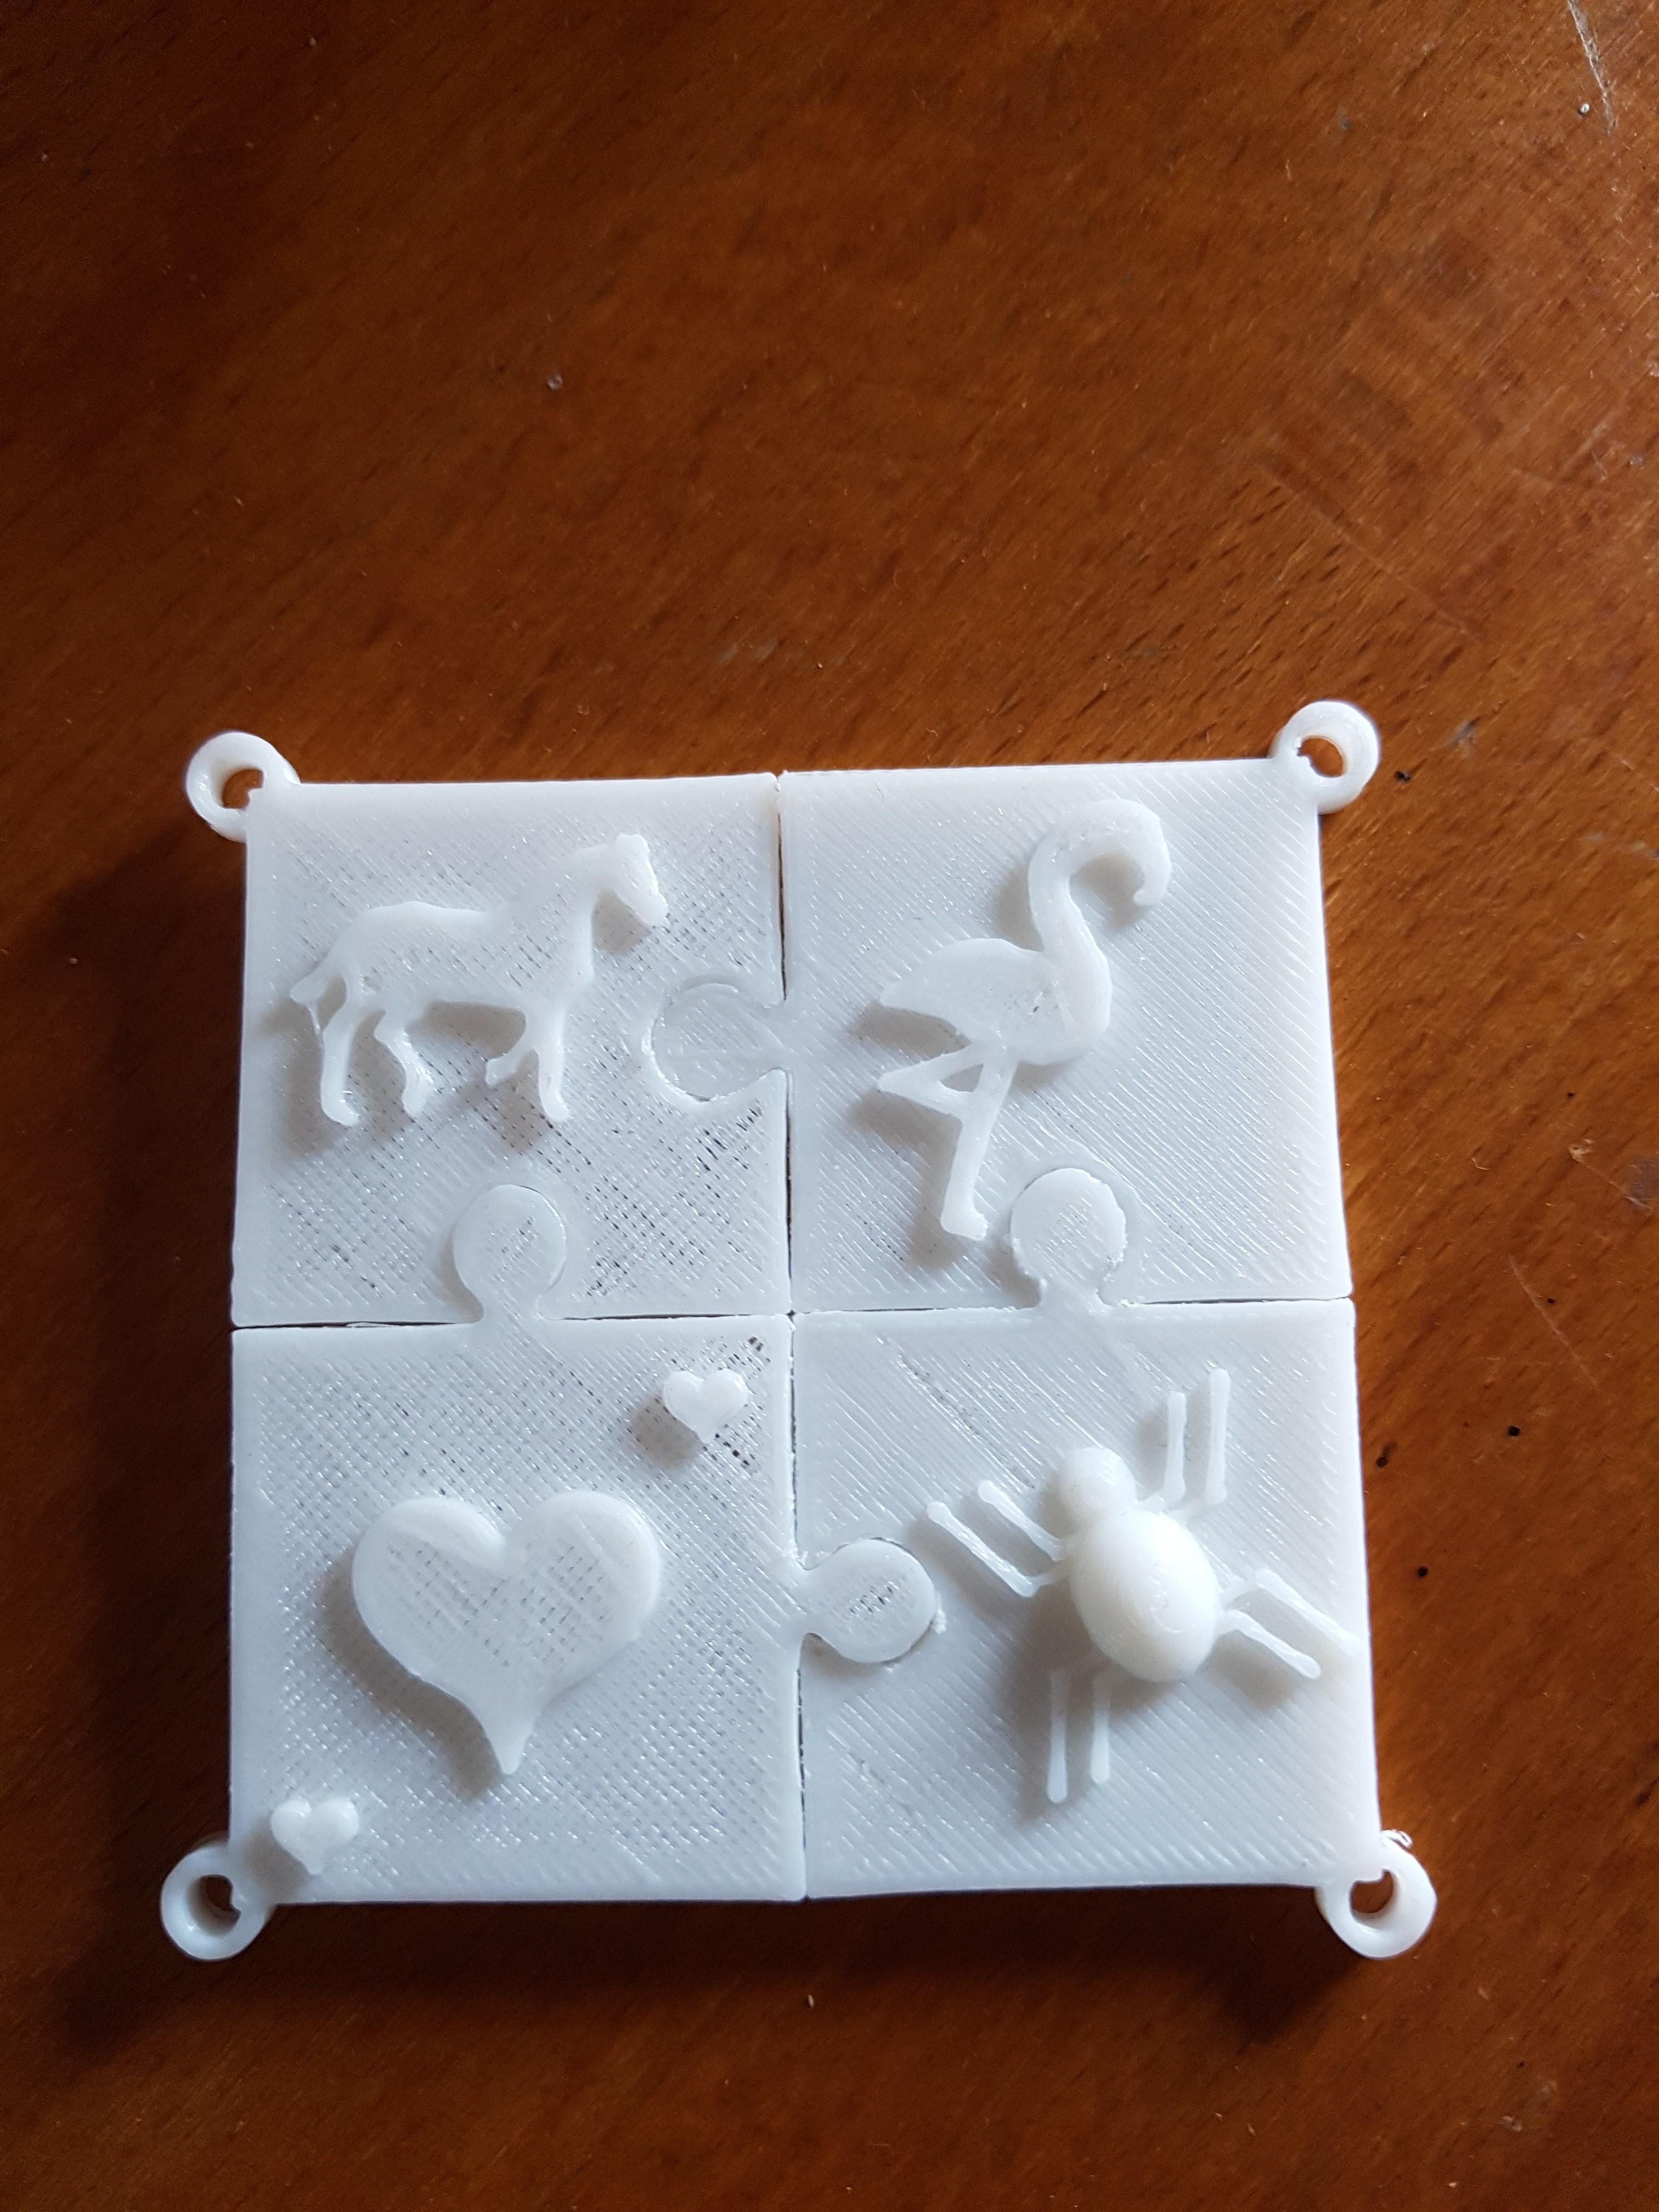 20180325_154449.jpg Download STL file puzzle key ring • 3D printing design, catf3d